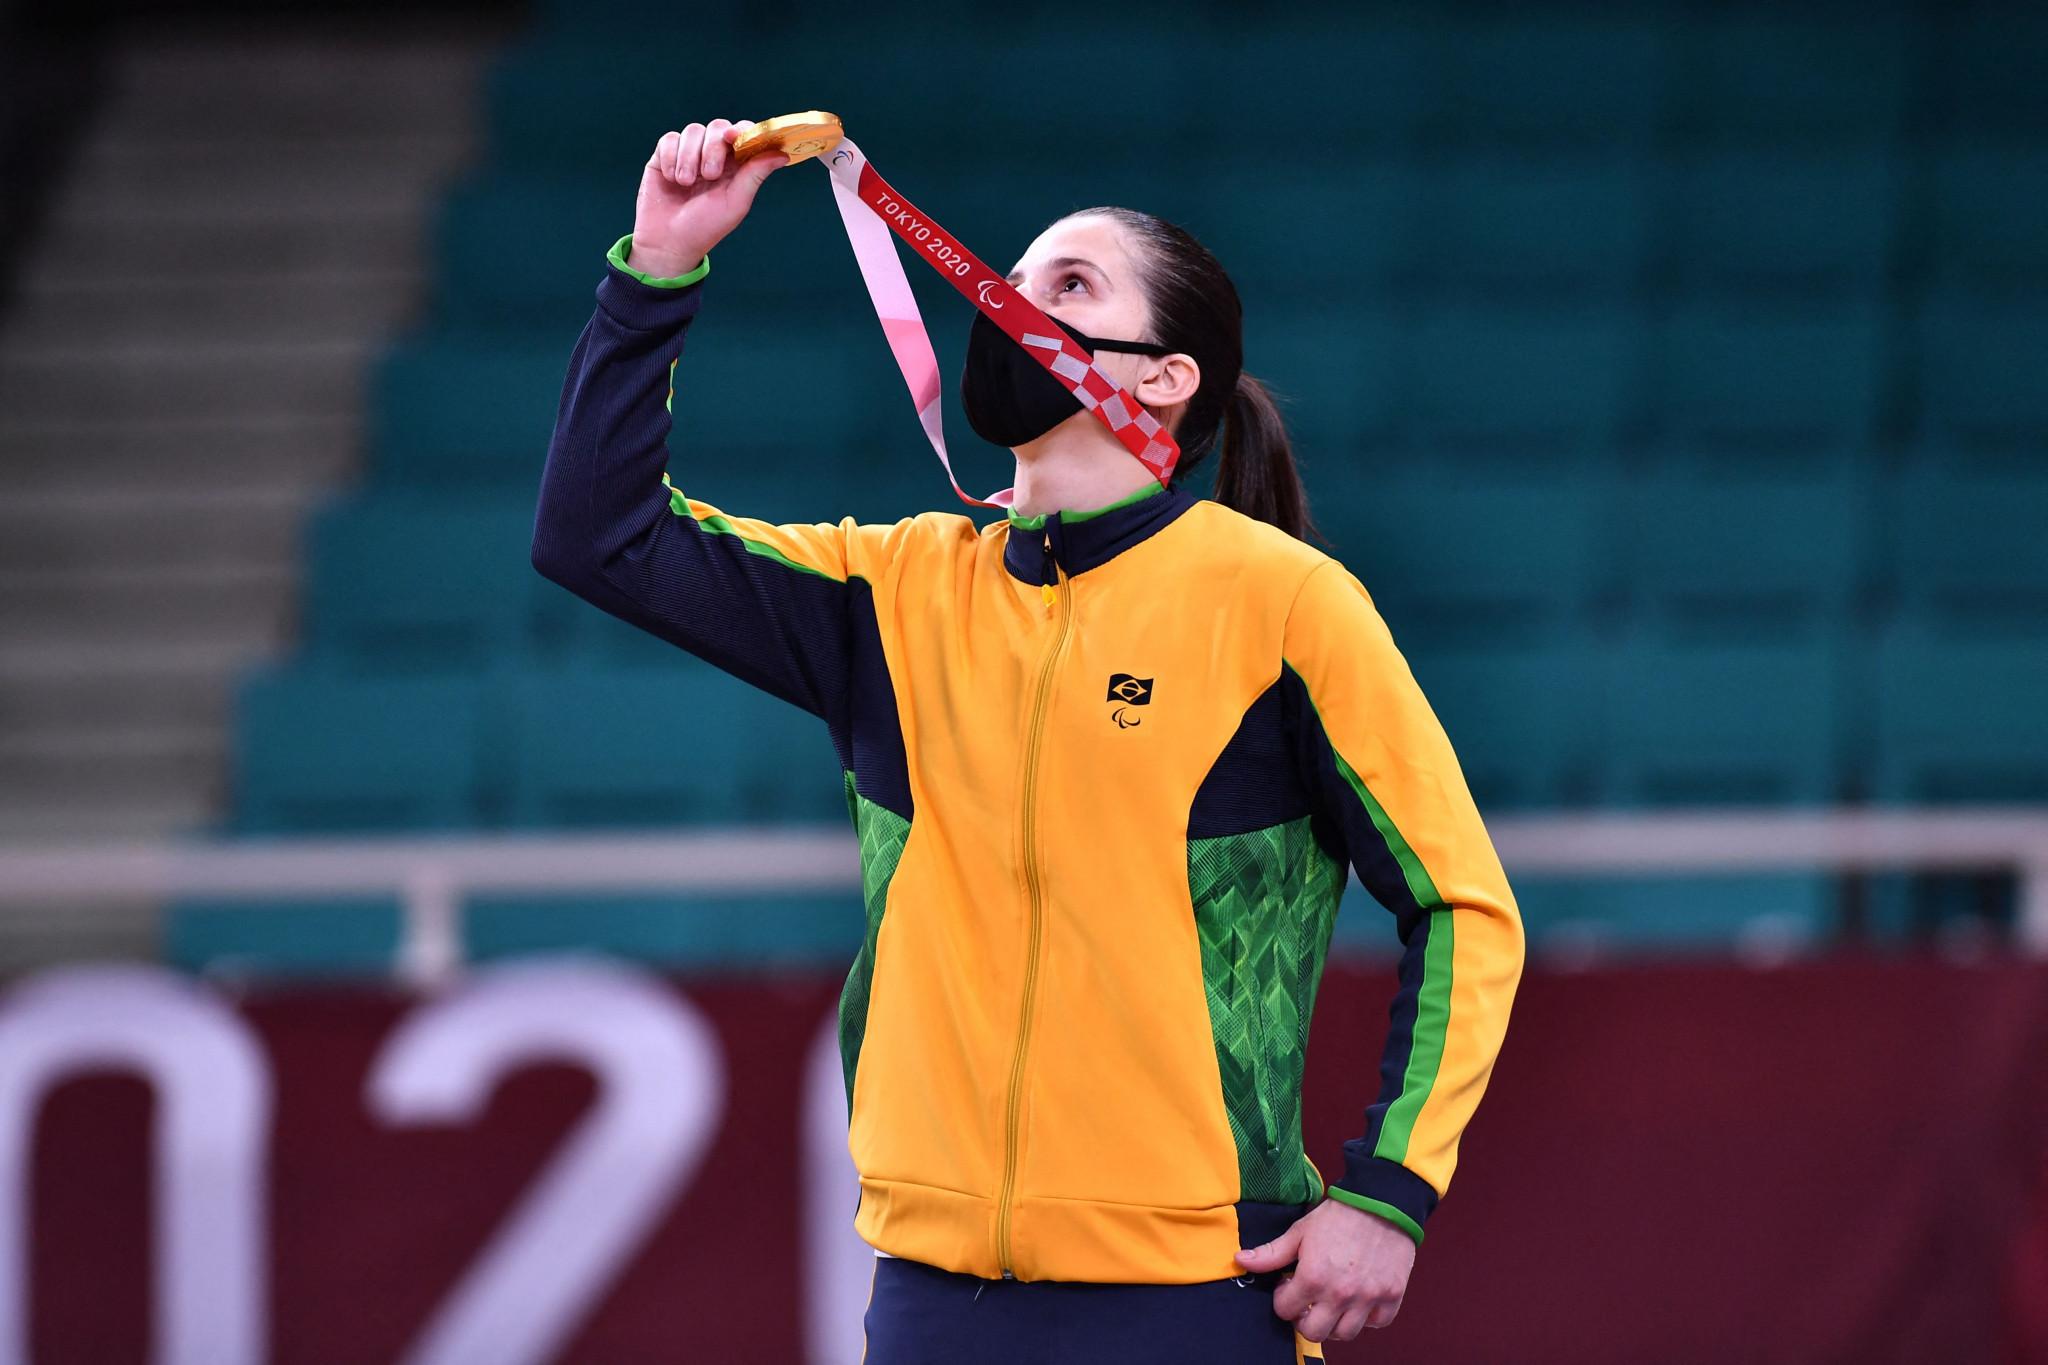 Maldonado upgrades to gold at Tokyo 2020 as judo competition concludes